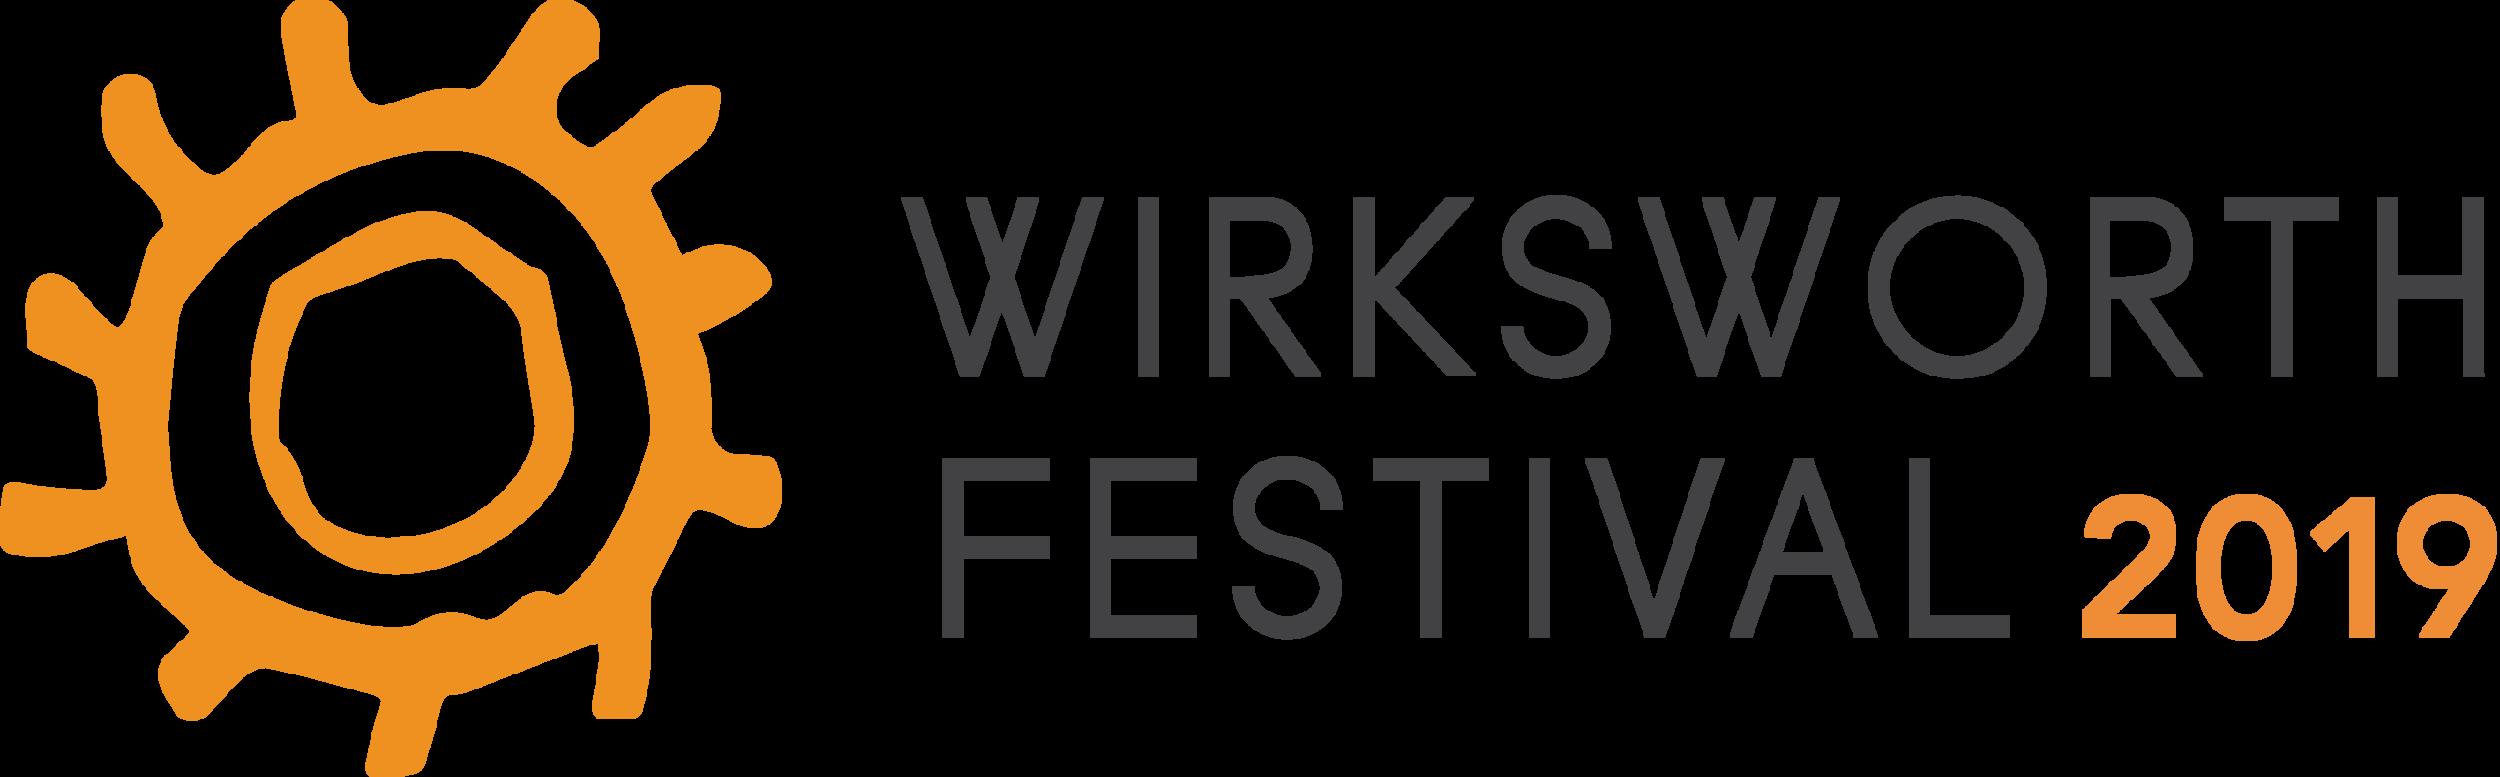 WF_Logo_WithDate.png